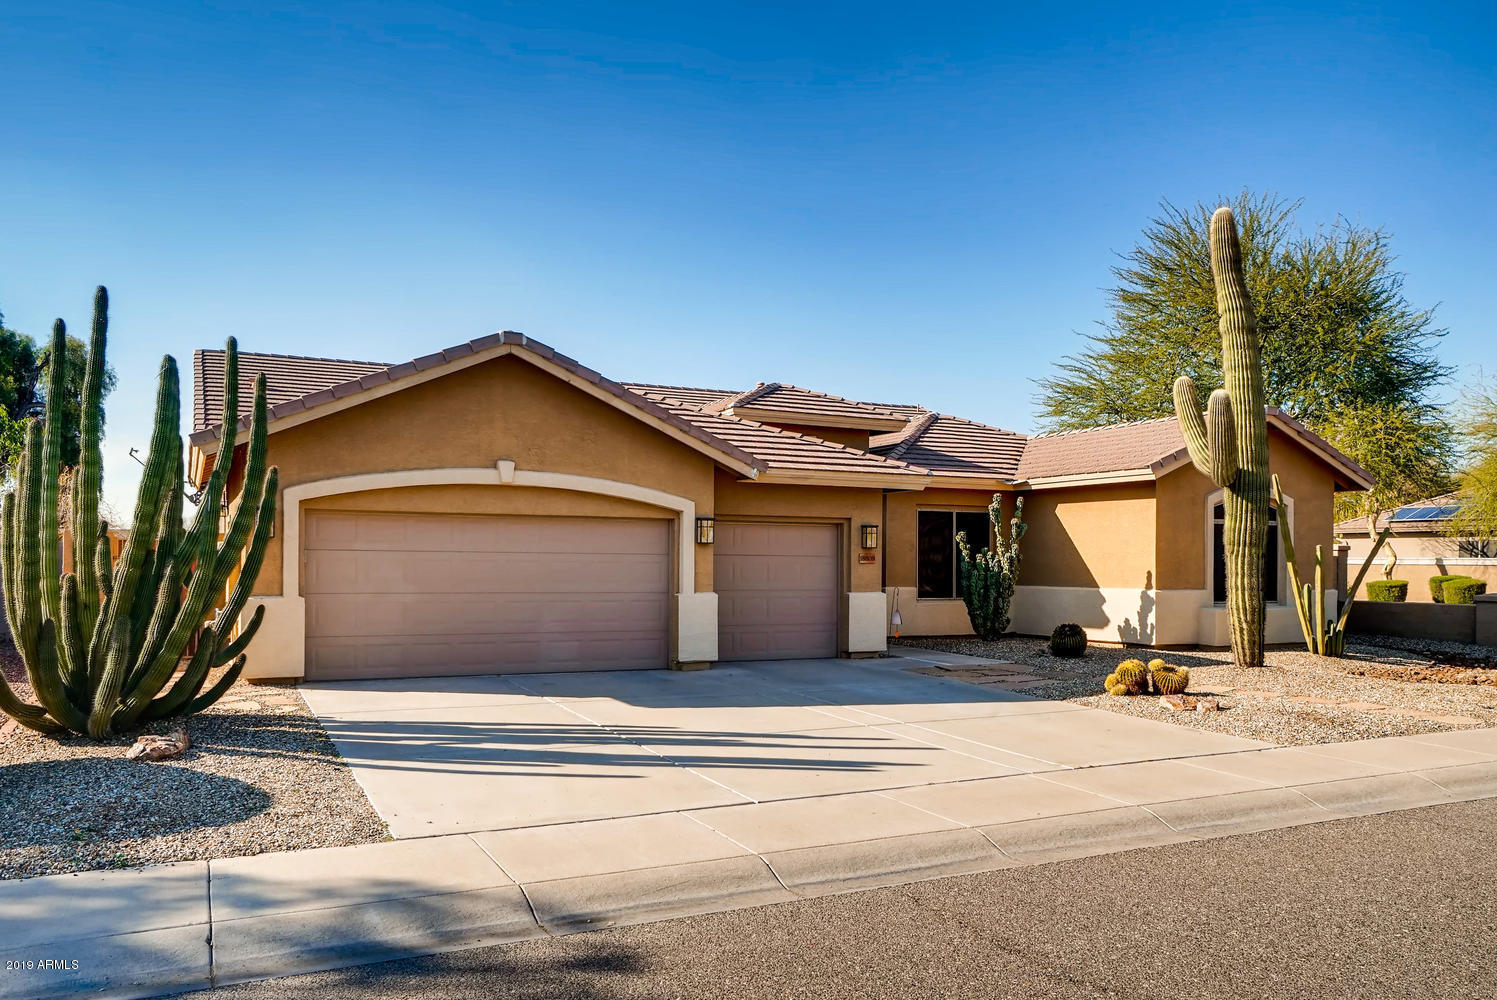 MLS 5867898 18808 N 62nd Drive, Glendale, AZ 85308 Glendale AZ Condo or Townhome